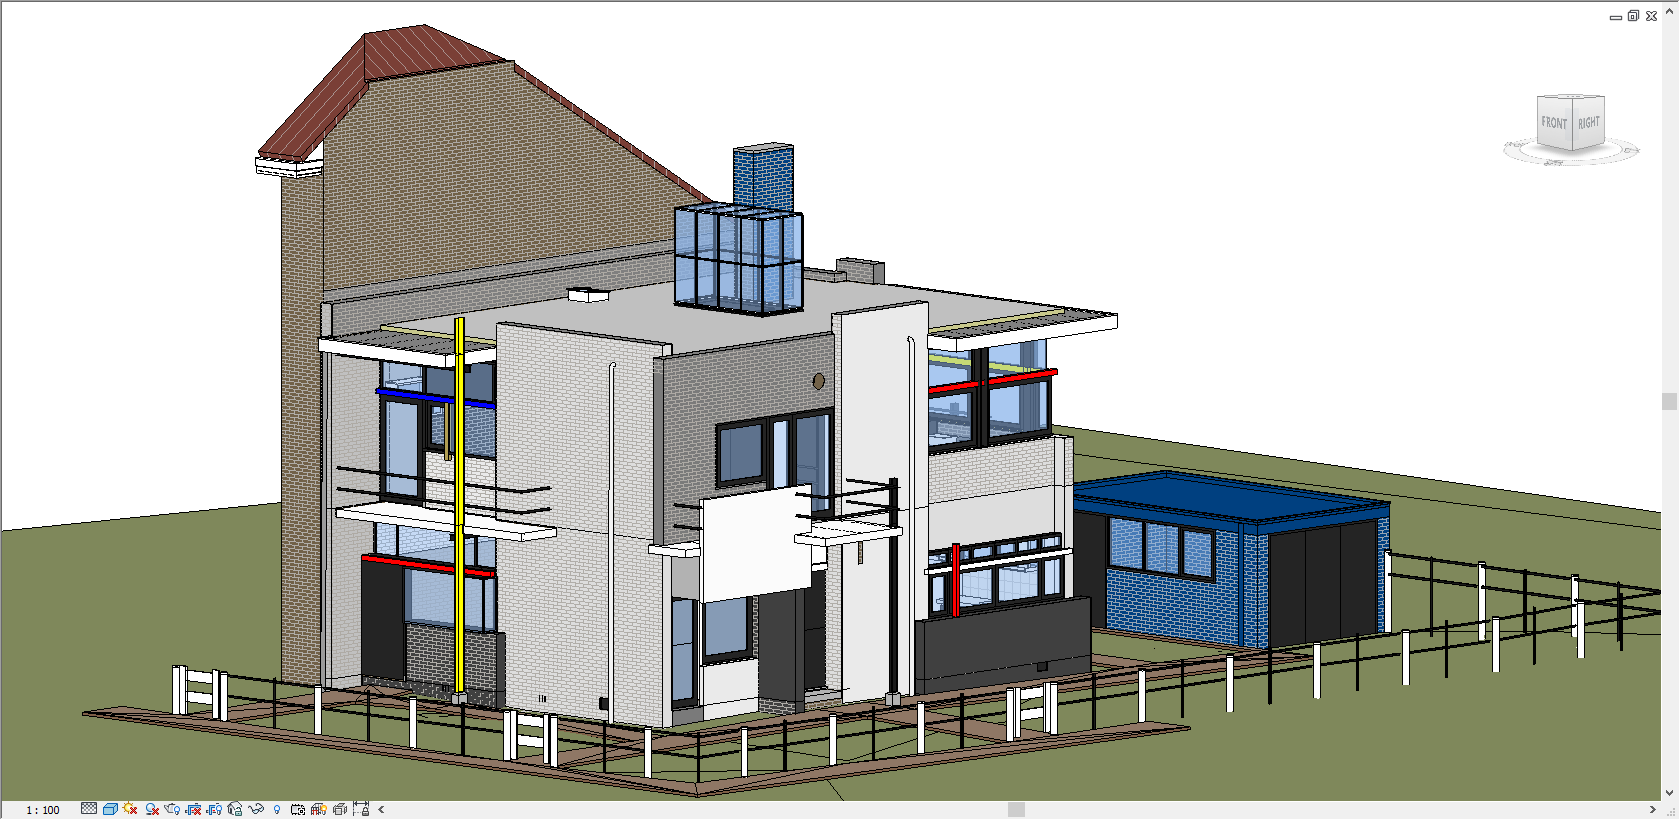 3D model Rietveld Schröderhuis